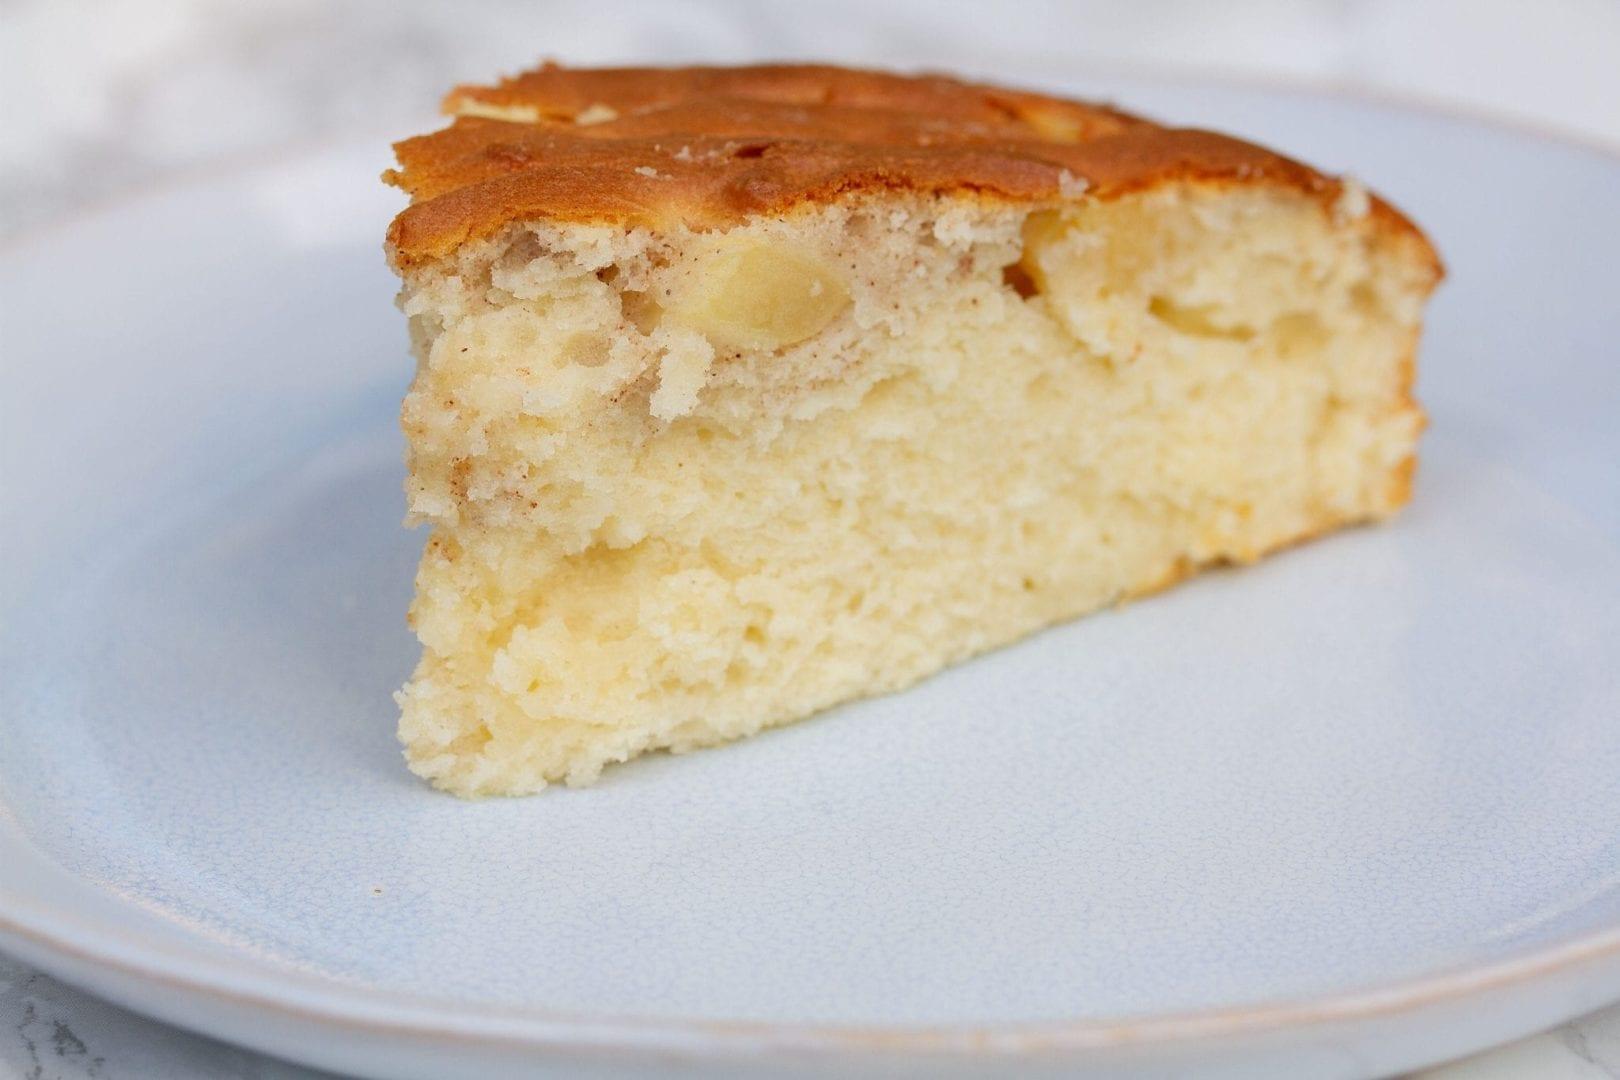 Gluten free cake - apple and cinnamon cake